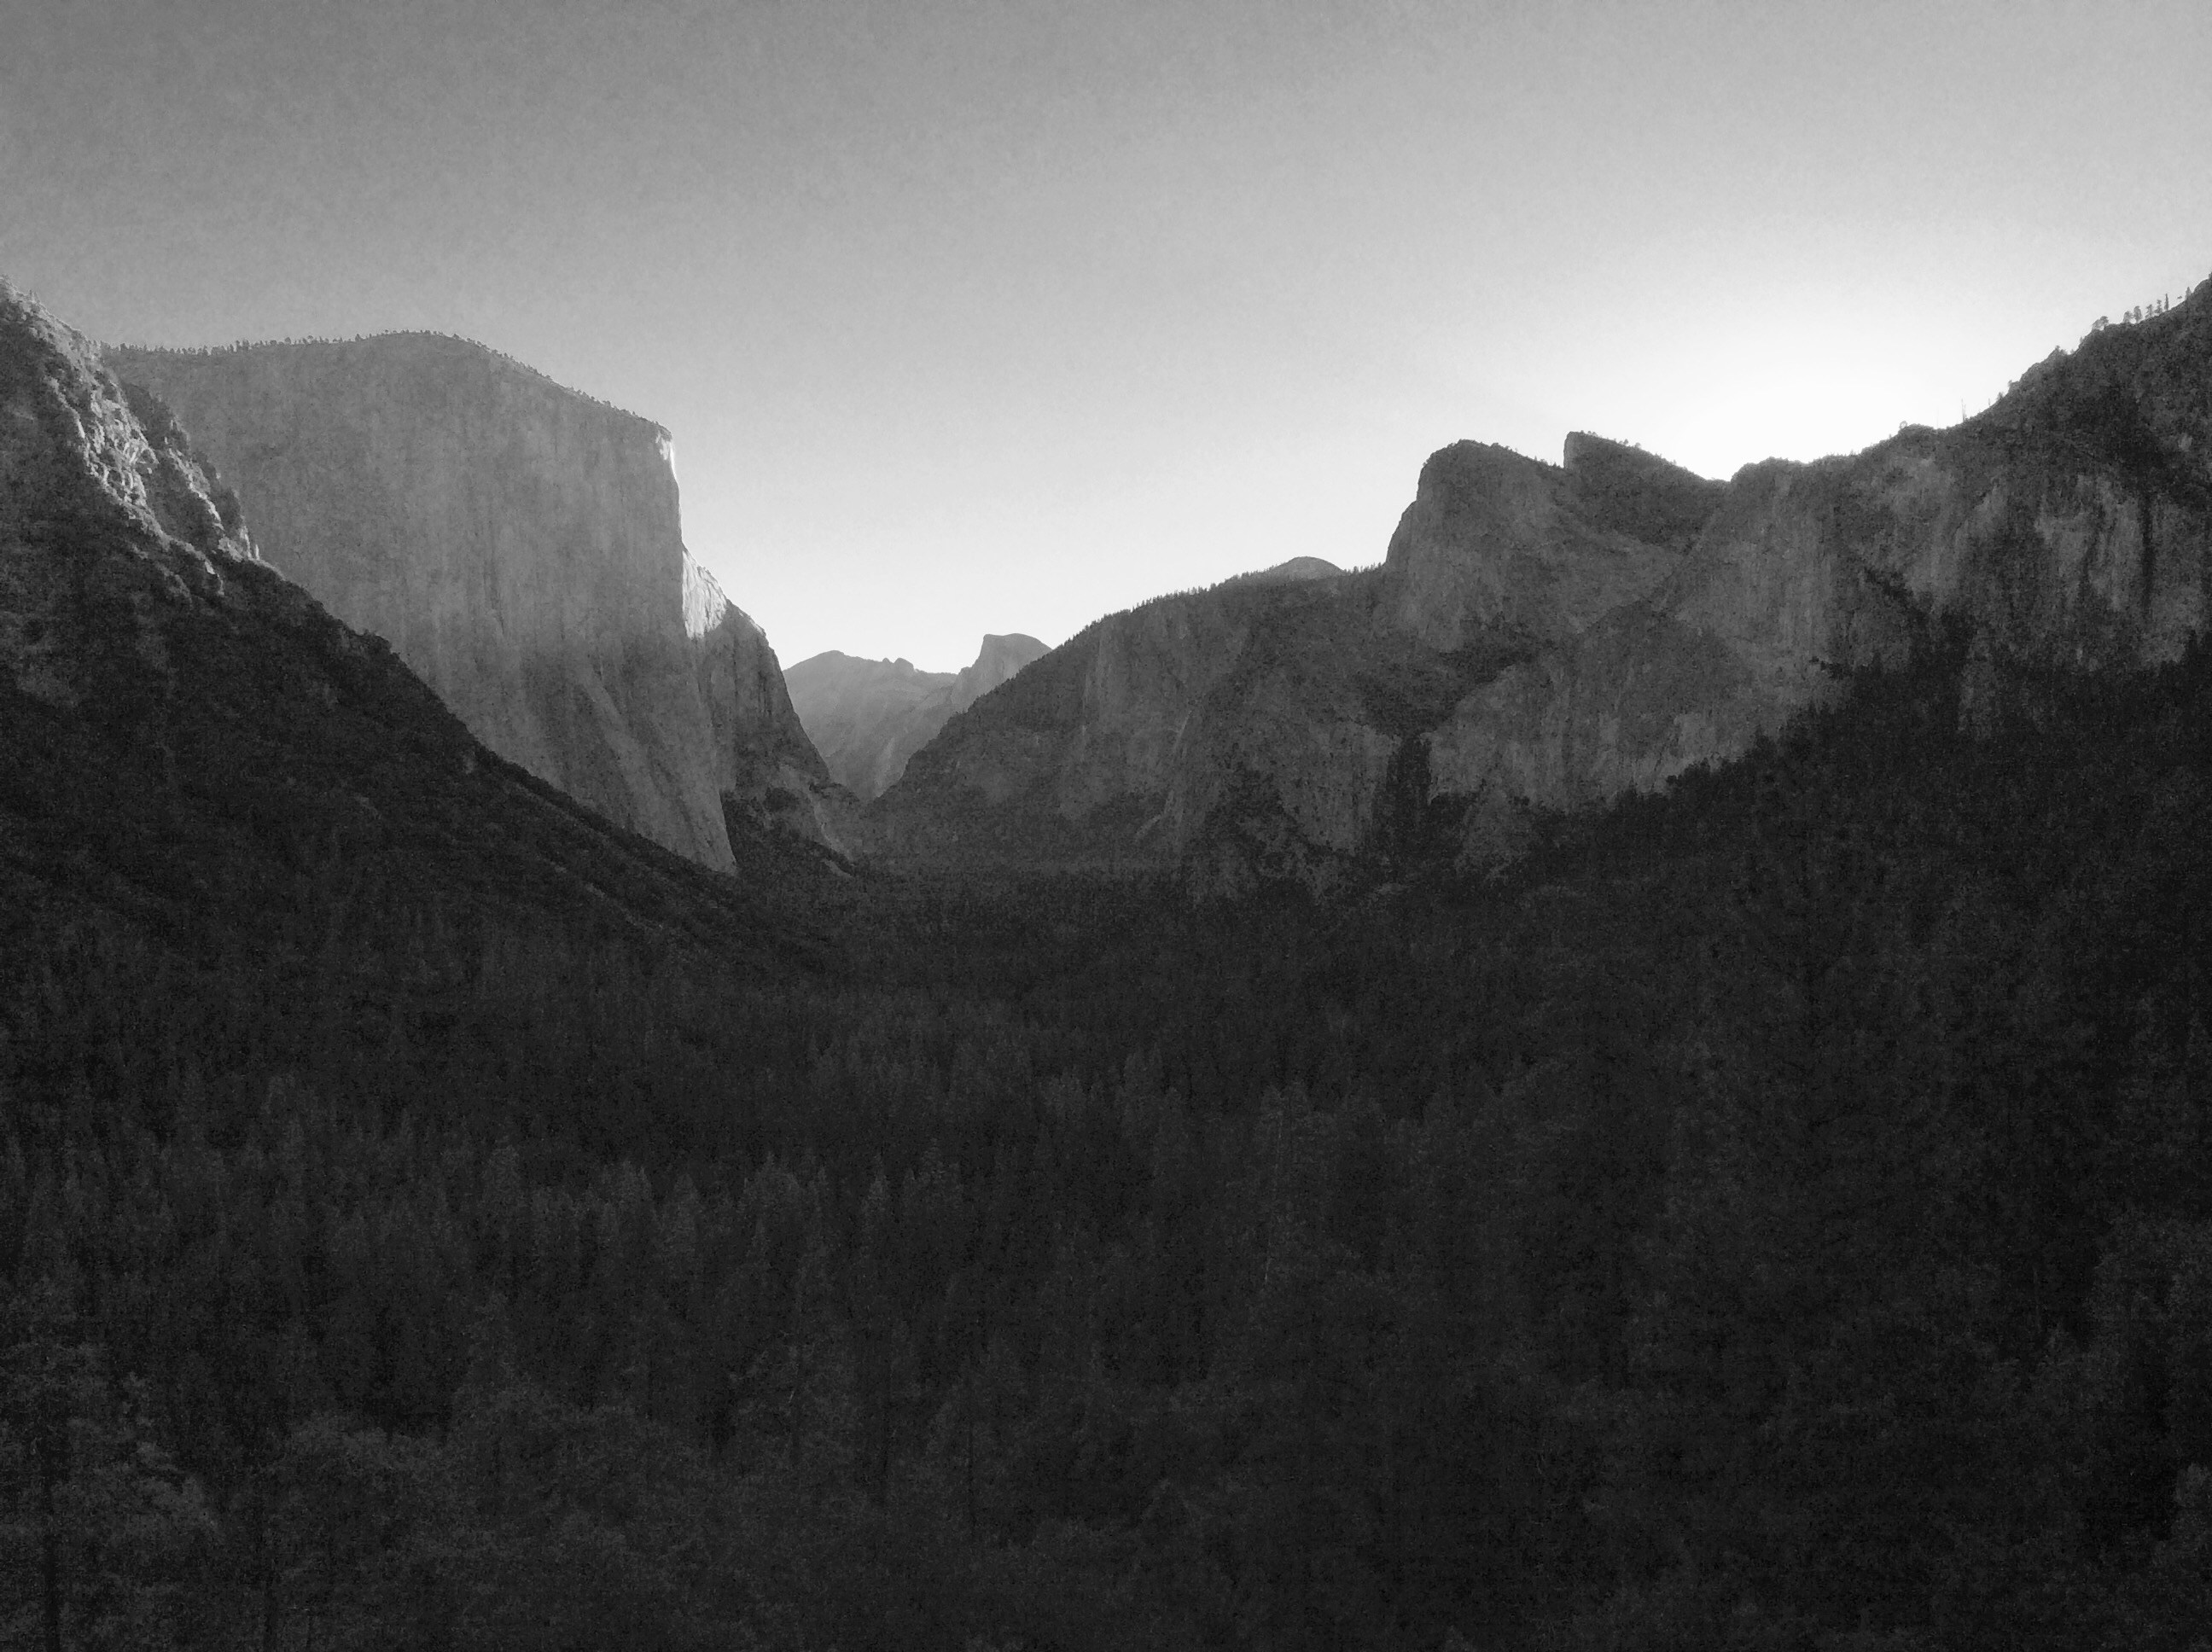 El Captain, Yosemite NP, Californie, USA